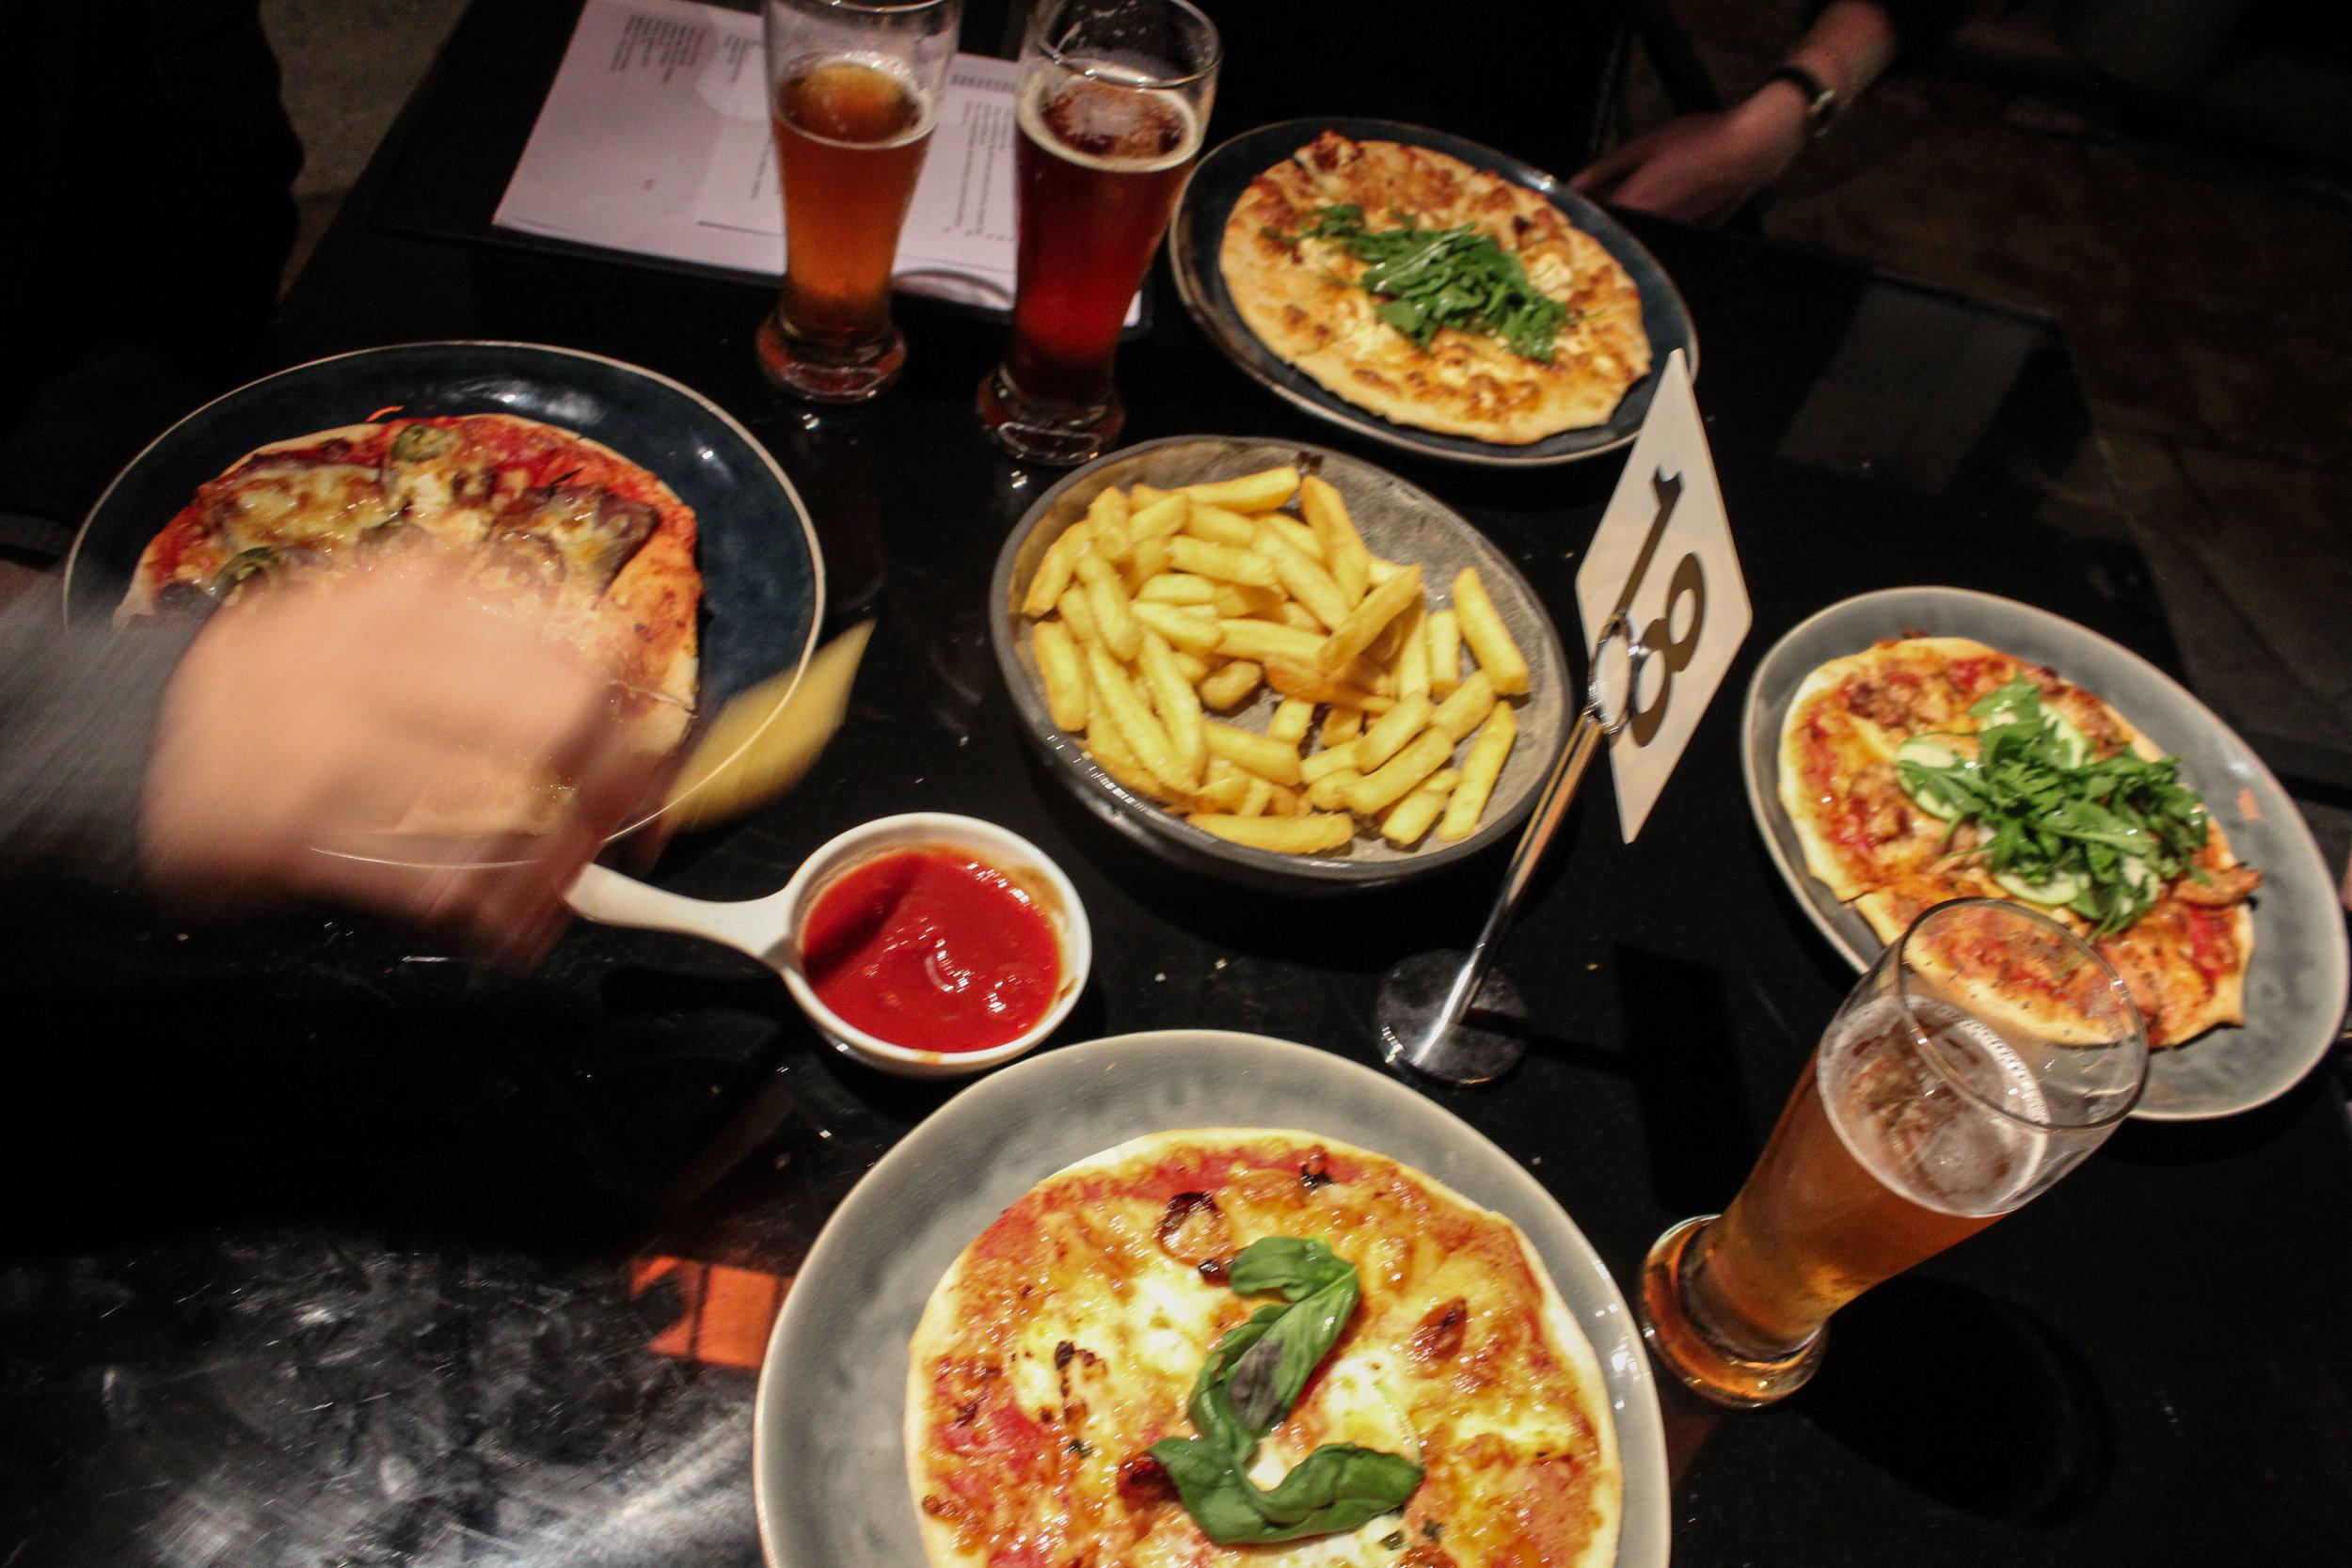 rutherglen_brewery_pizza